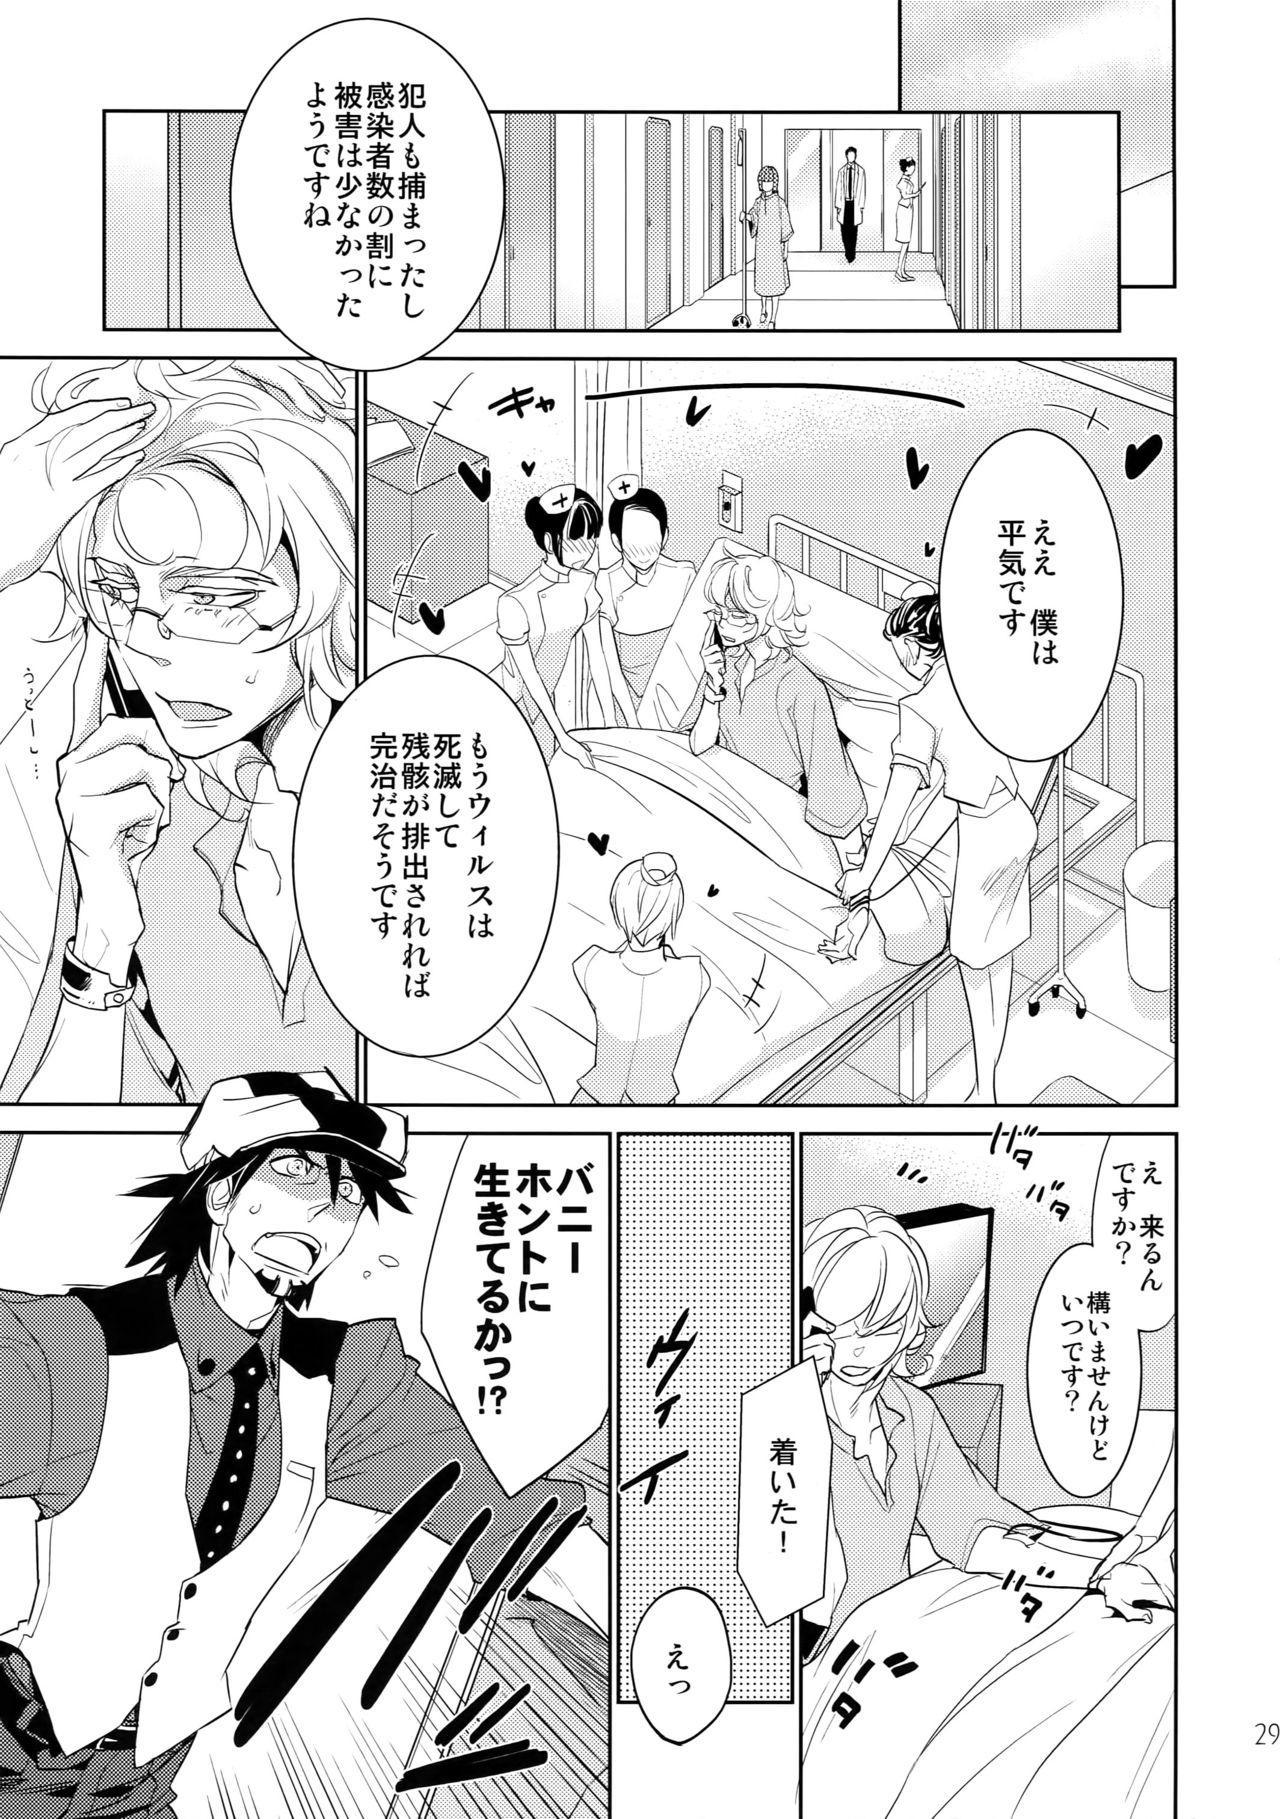 T&B Sairoku! 2 27